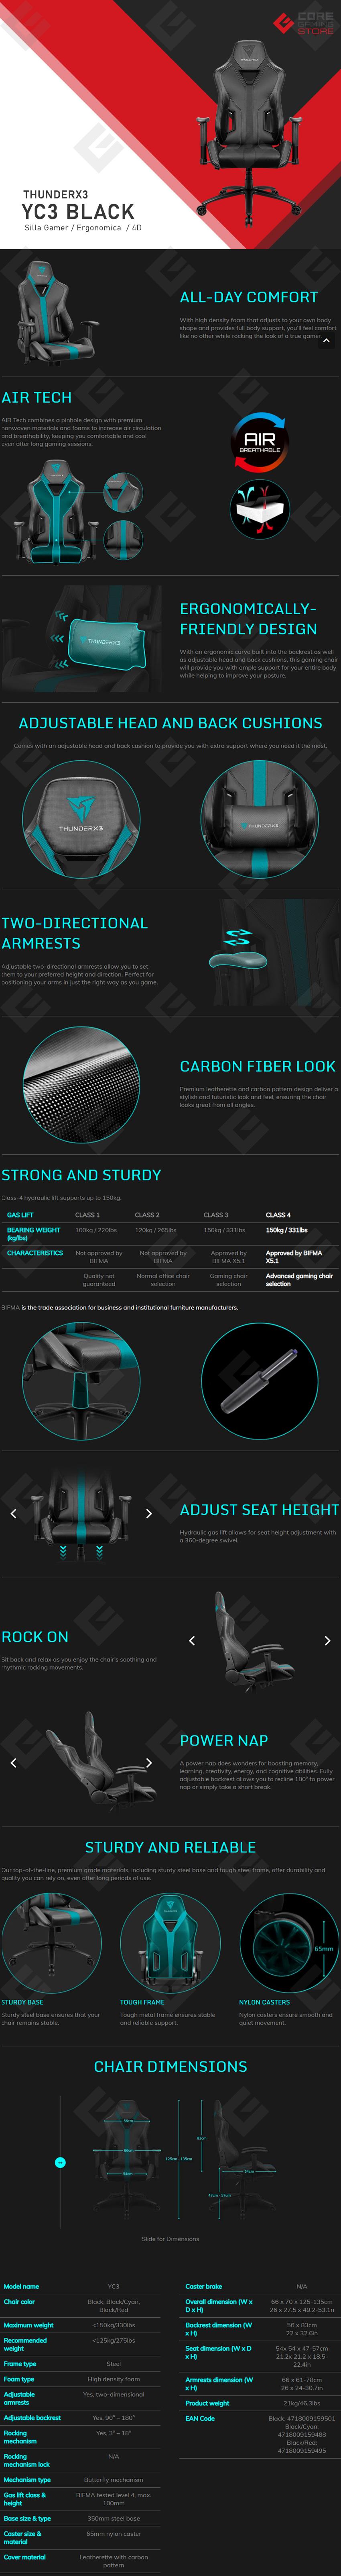 Silla Gamer Thunderx3 YC3 Black, Reclinable, 4D